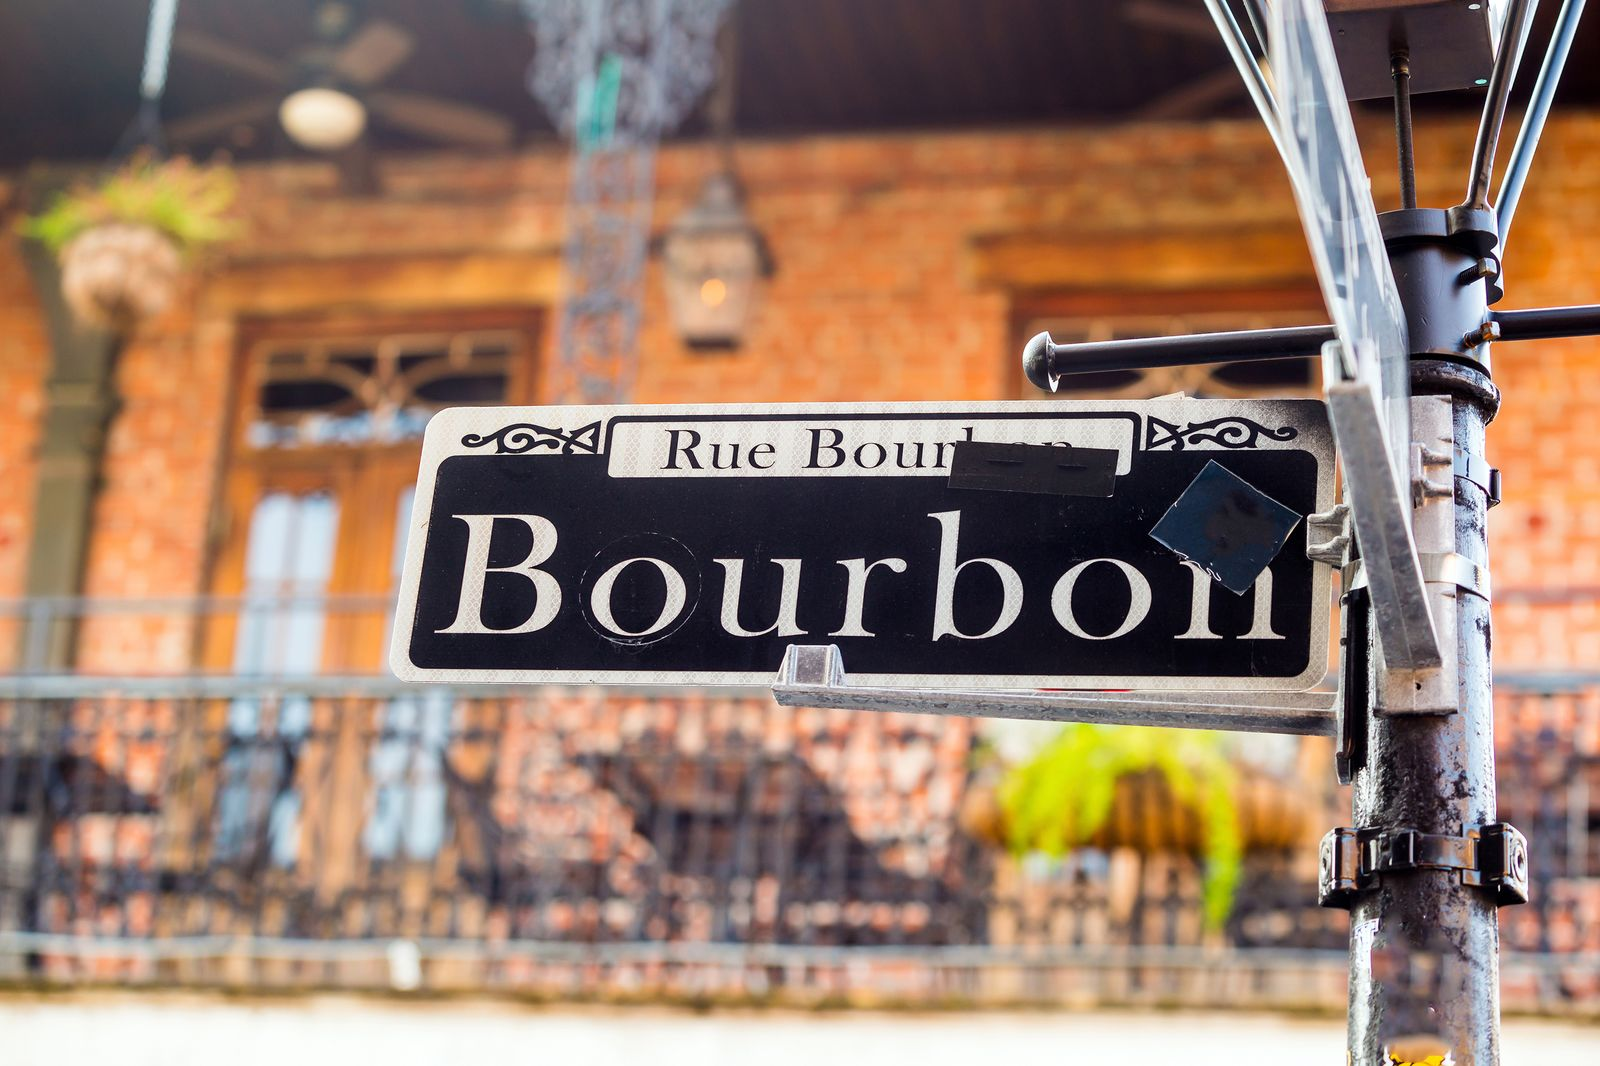 Straßenschild im French Quarter, New Orleans, Louisiana